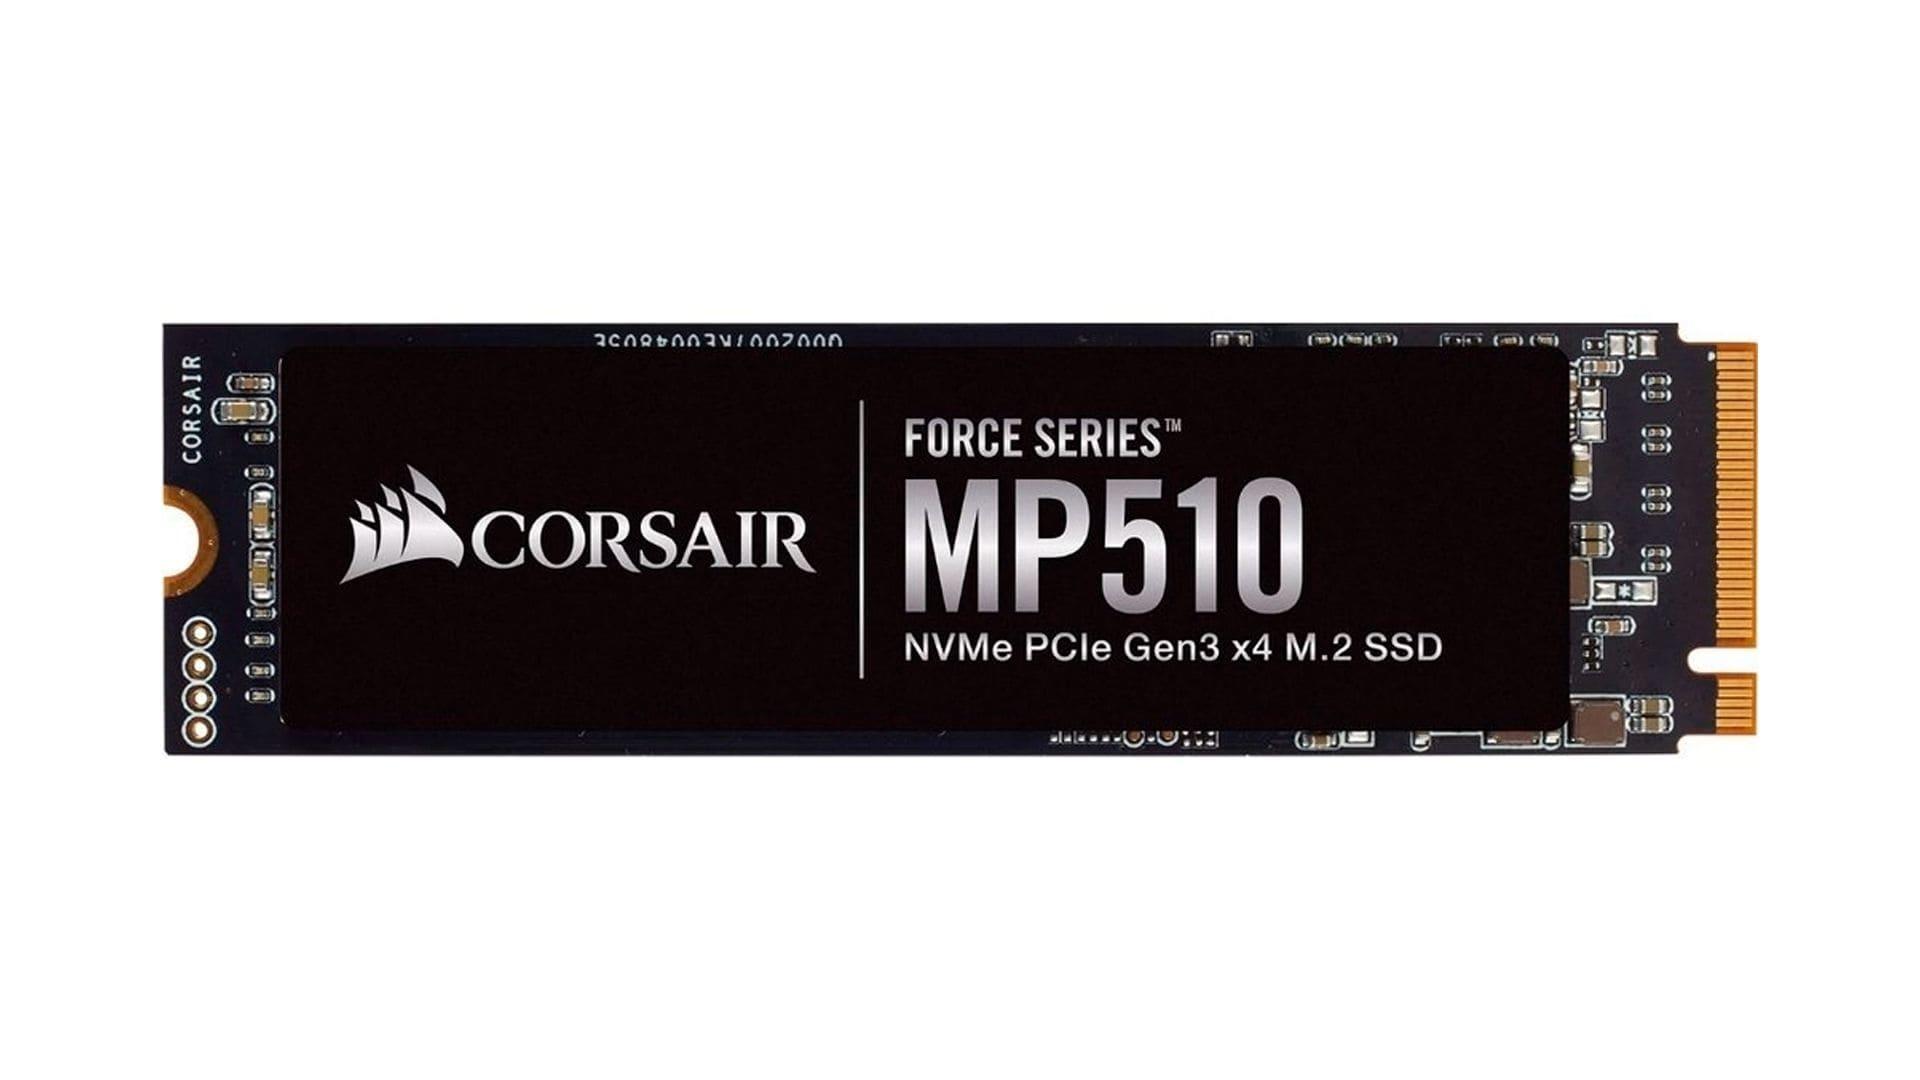 SSD 480GB M2 Corsair Force CSSD-F480GBMP510 preto no fundo branco